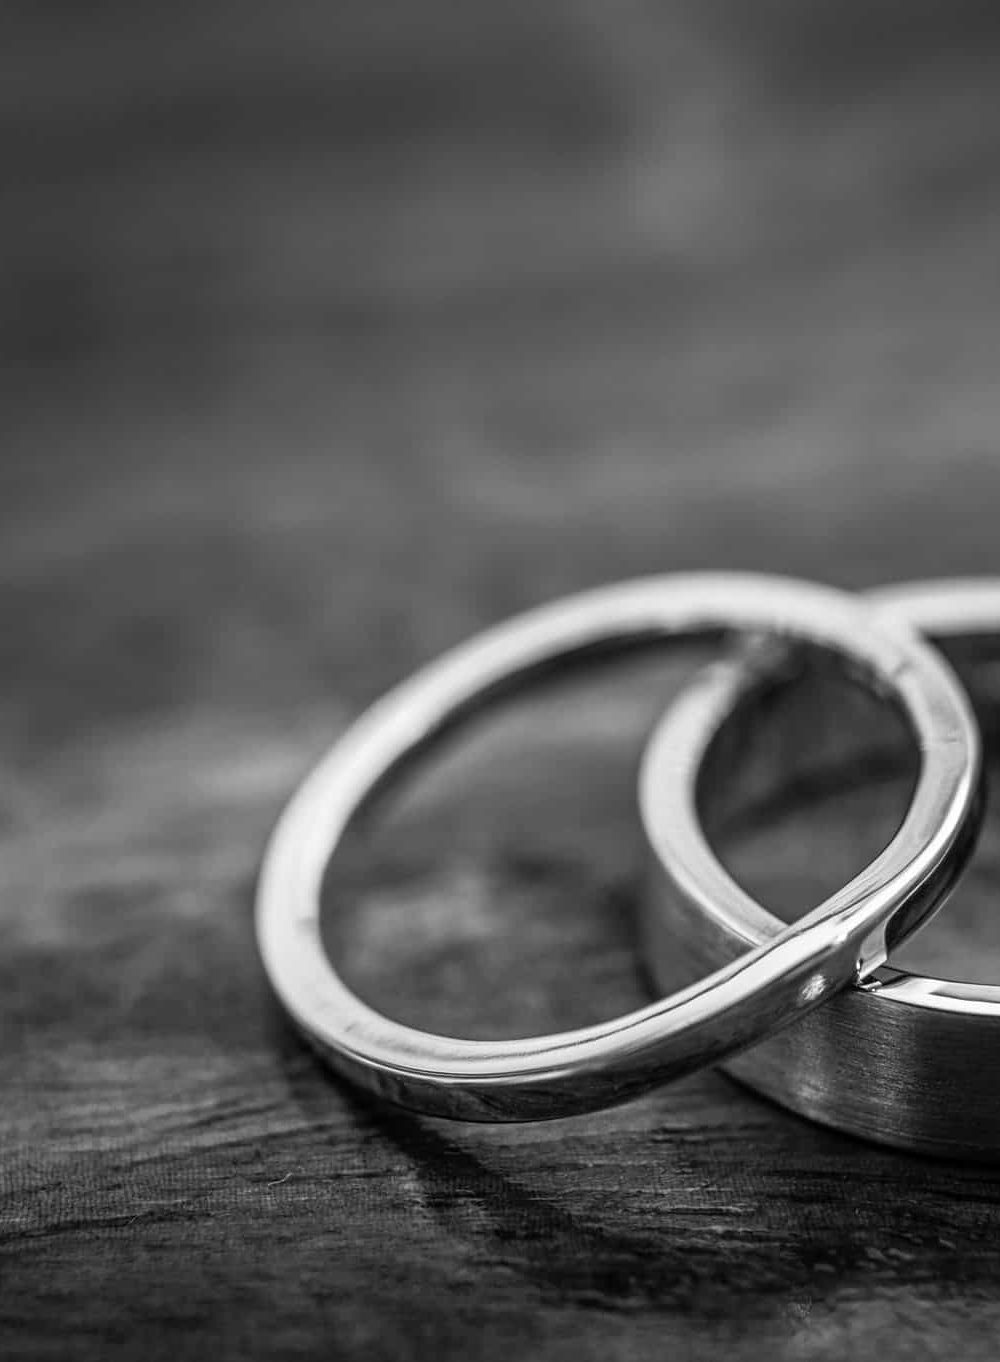 Palladium Wedding Rings On A Wooden Surface